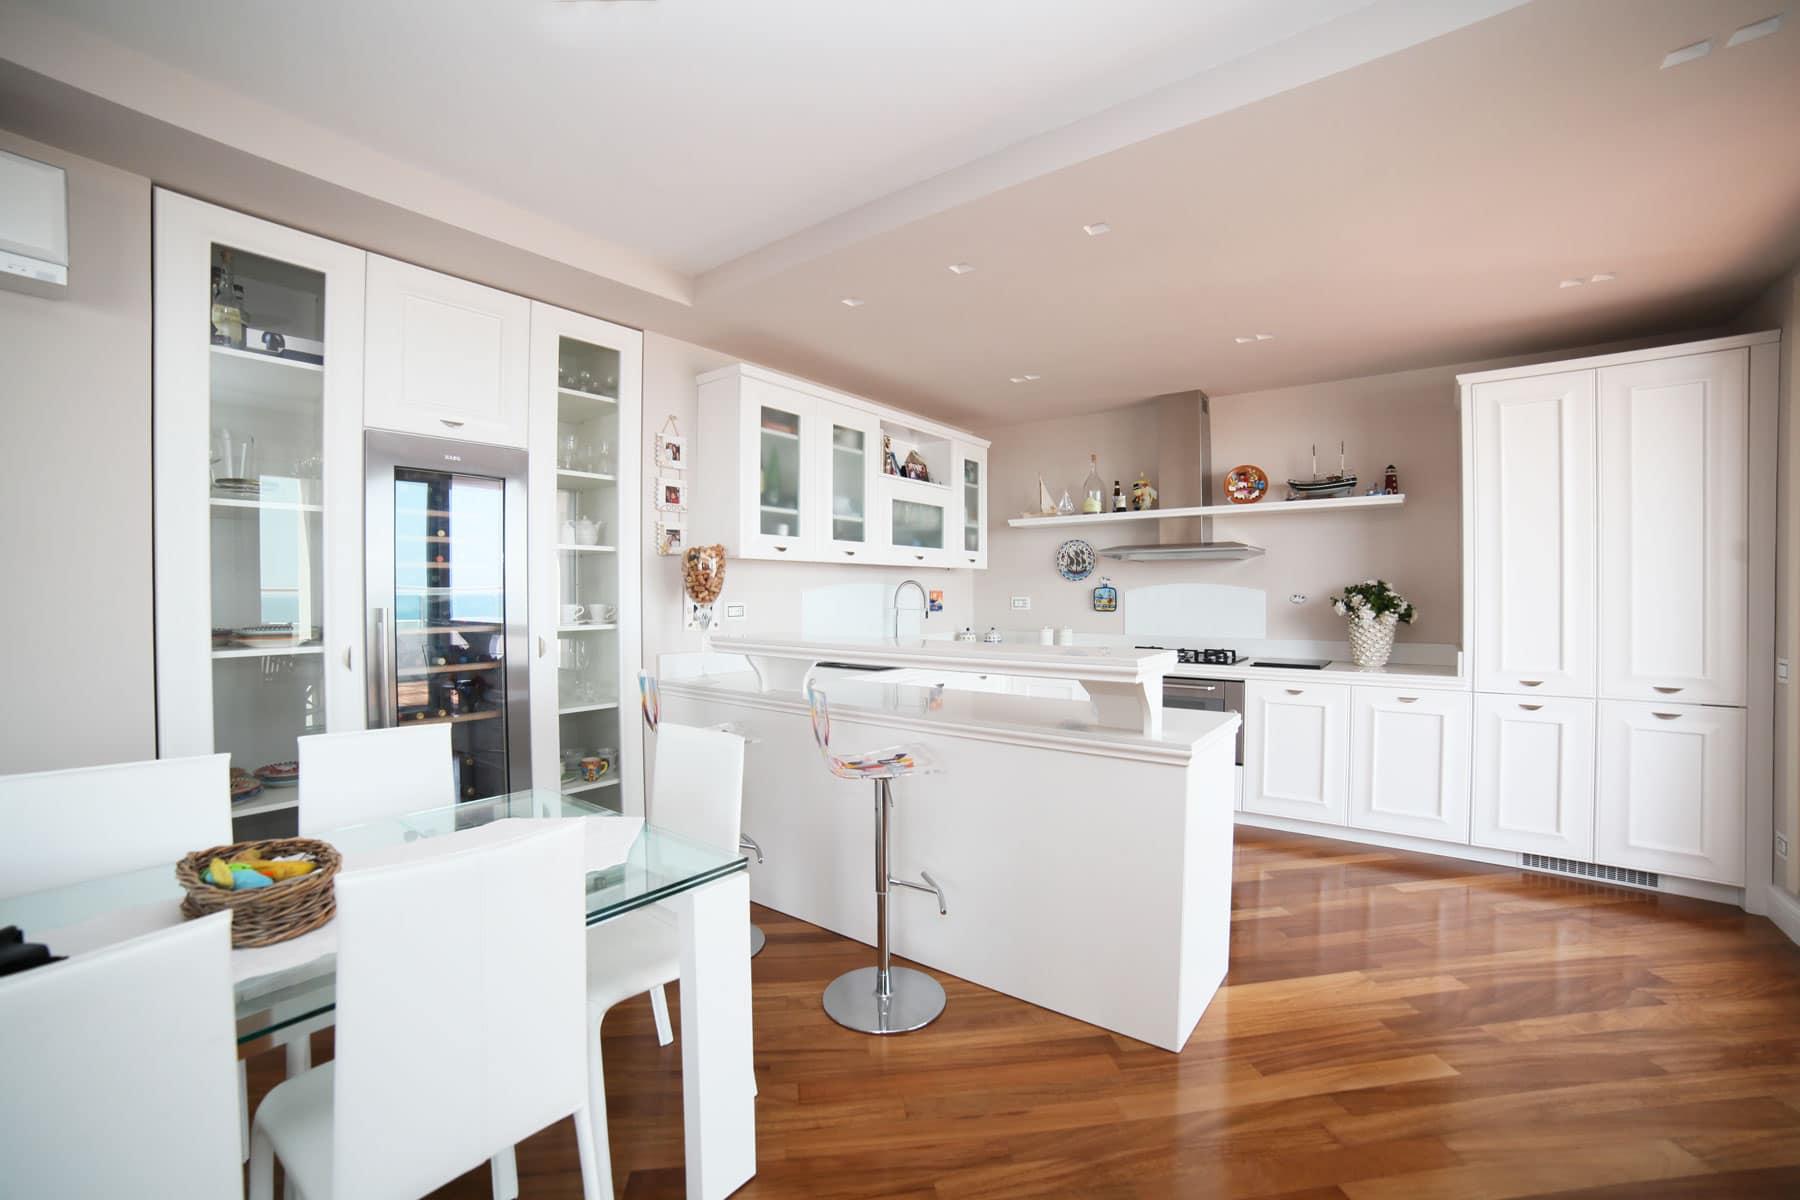 Cucina con piani in okite falegnameria caponi - Piani cucina in okite ...